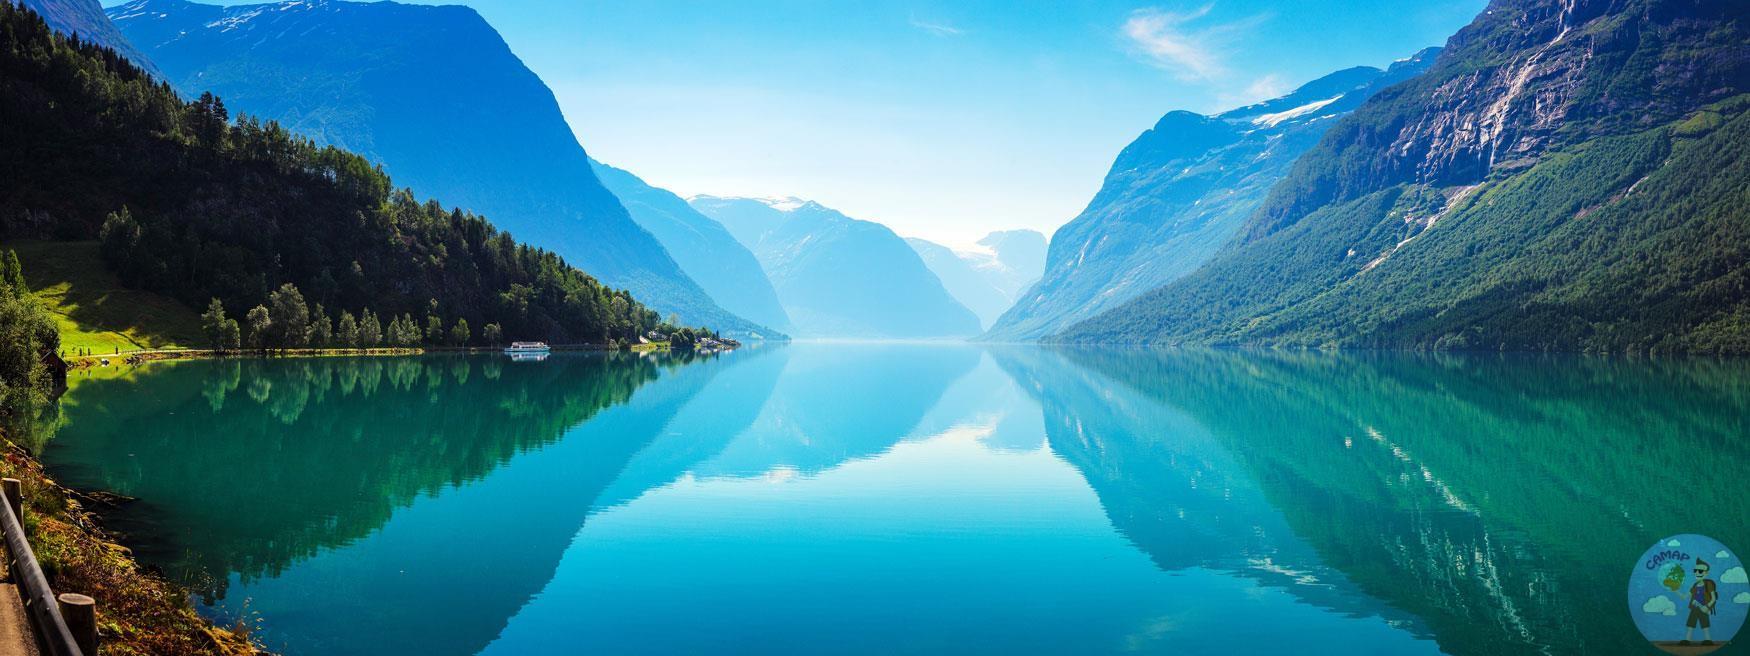 Нордфьорд река